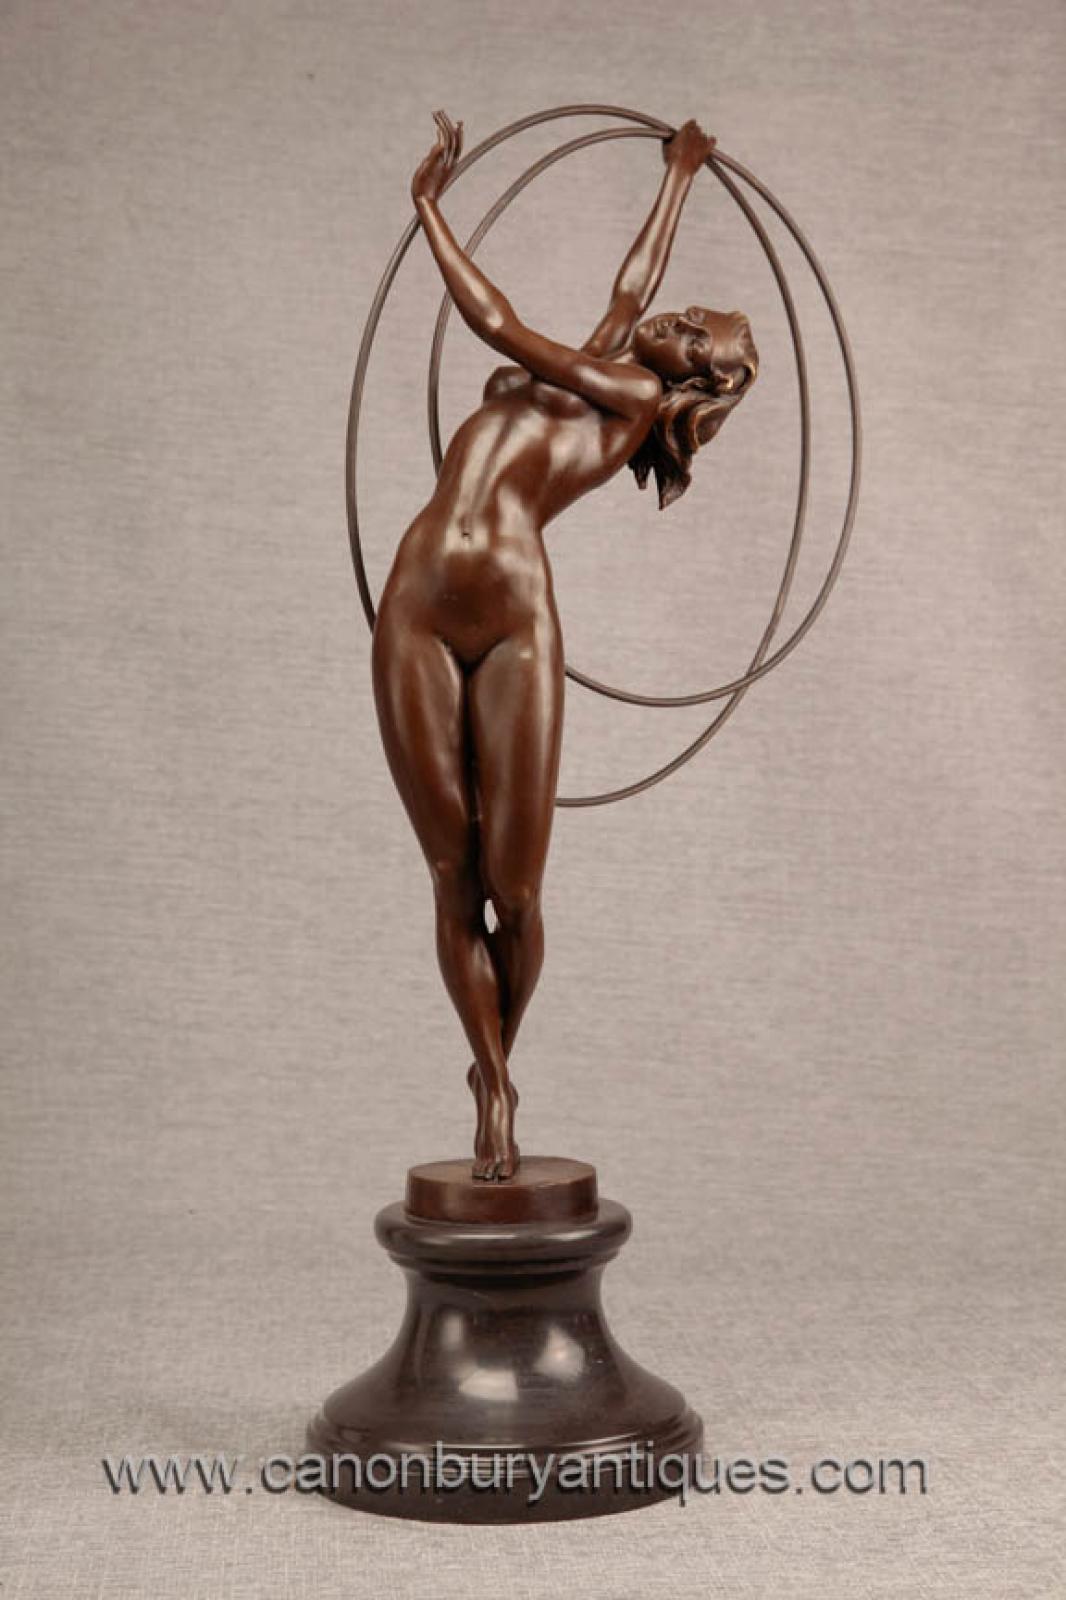 art deco bronze hoop dancer statue figurine 1920s flapper. Black Bedroom Furniture Sets. Home Design Ideas